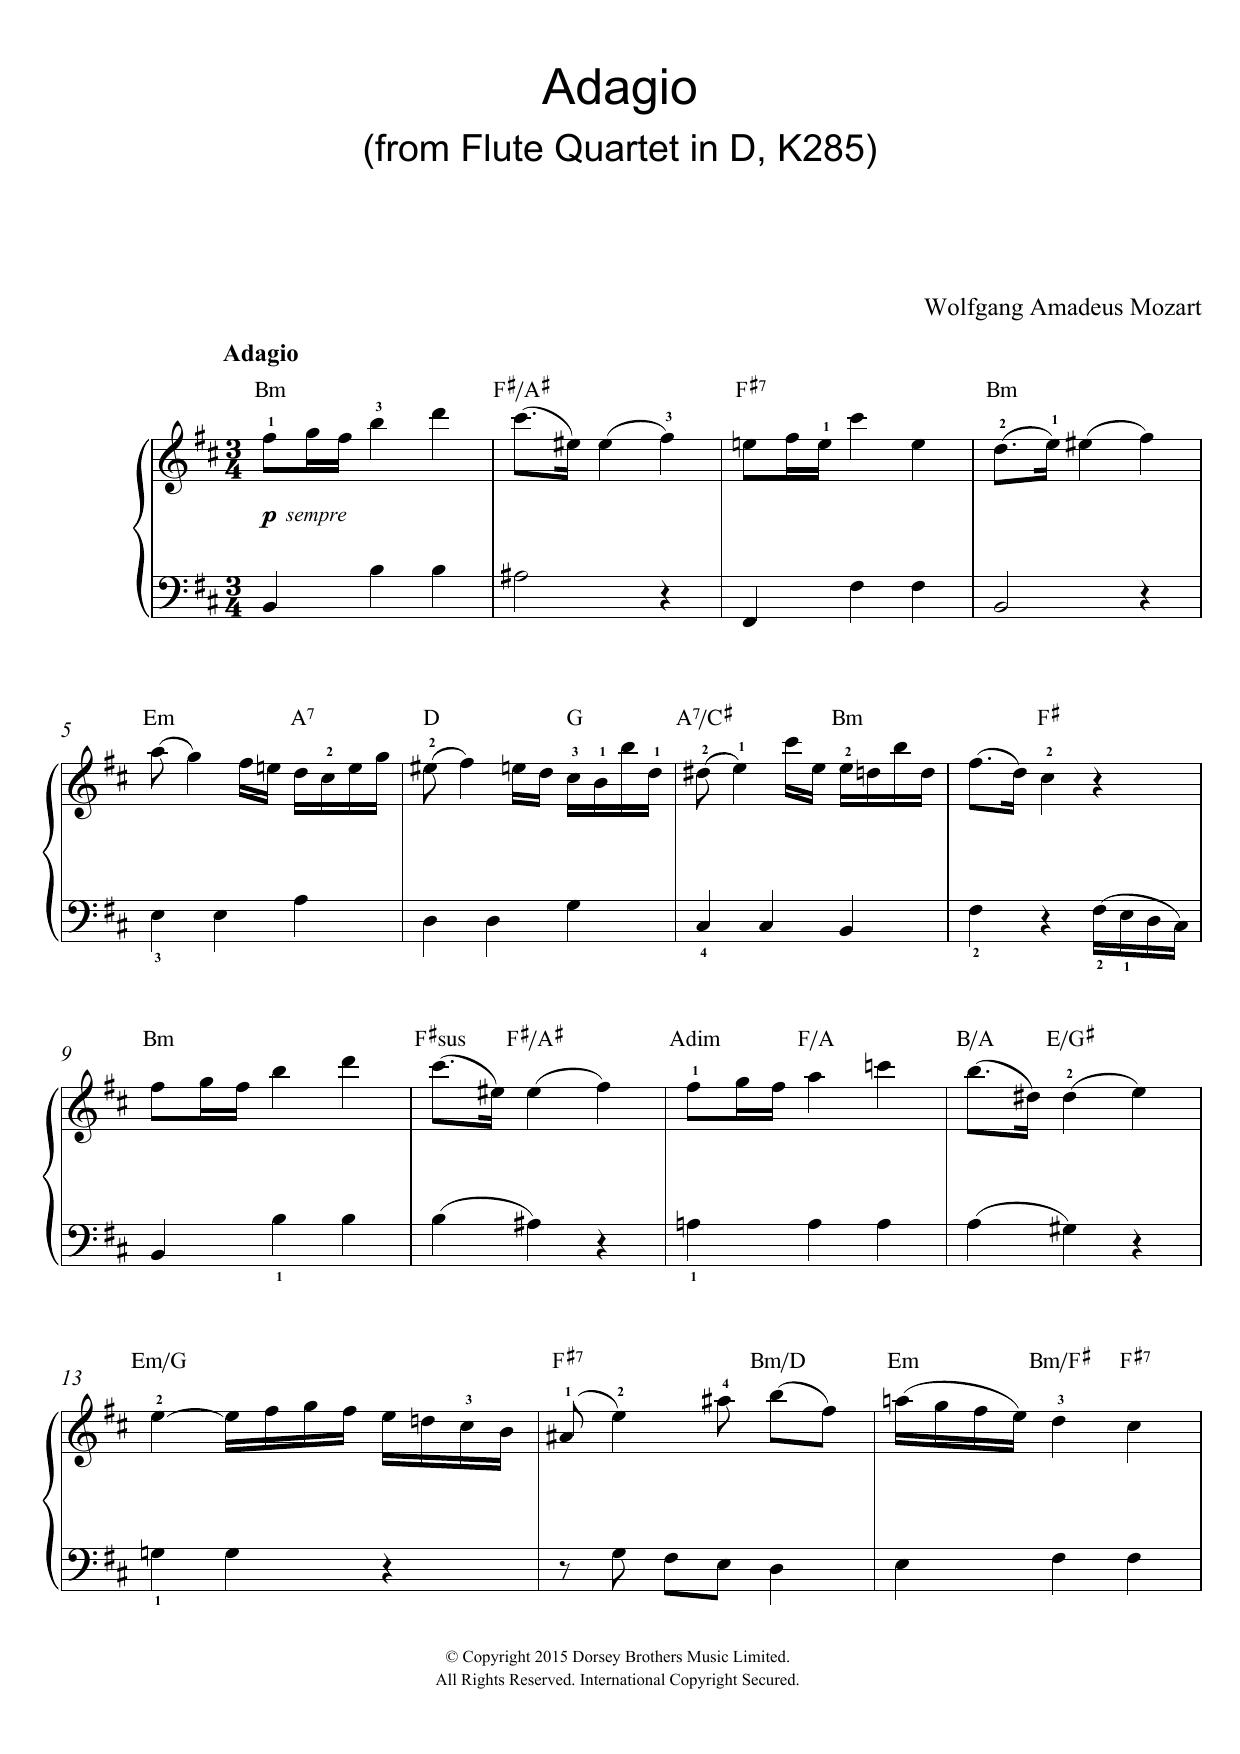 Wolfgang Amadeus Mozart - Adagio (from Flute Quartet In D, K285)